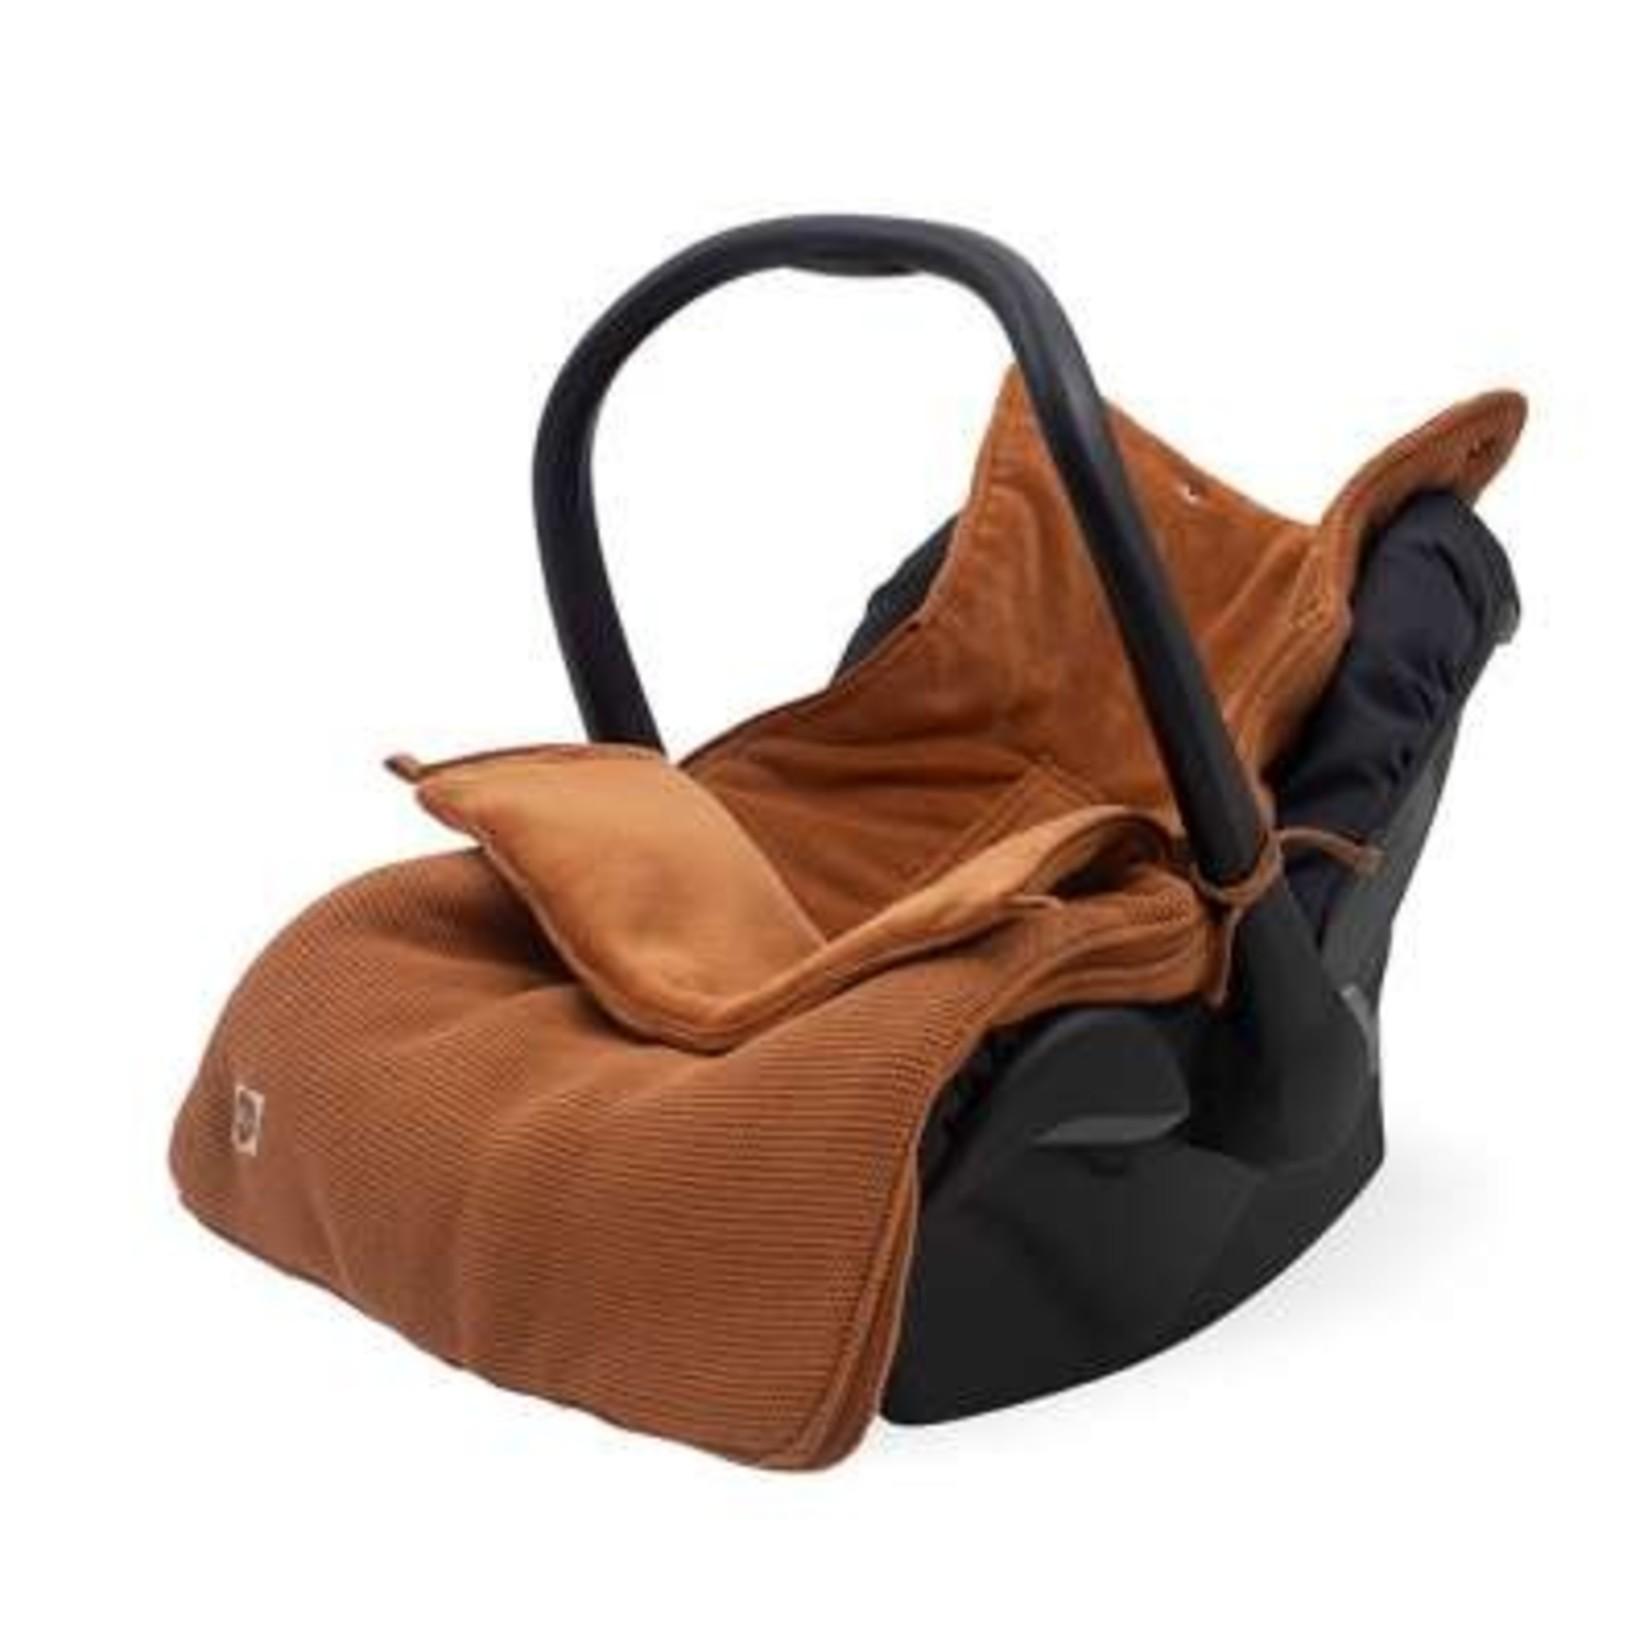 Jollein Jollein Voetenzak Maxi-cosi Basic Knit Caramel